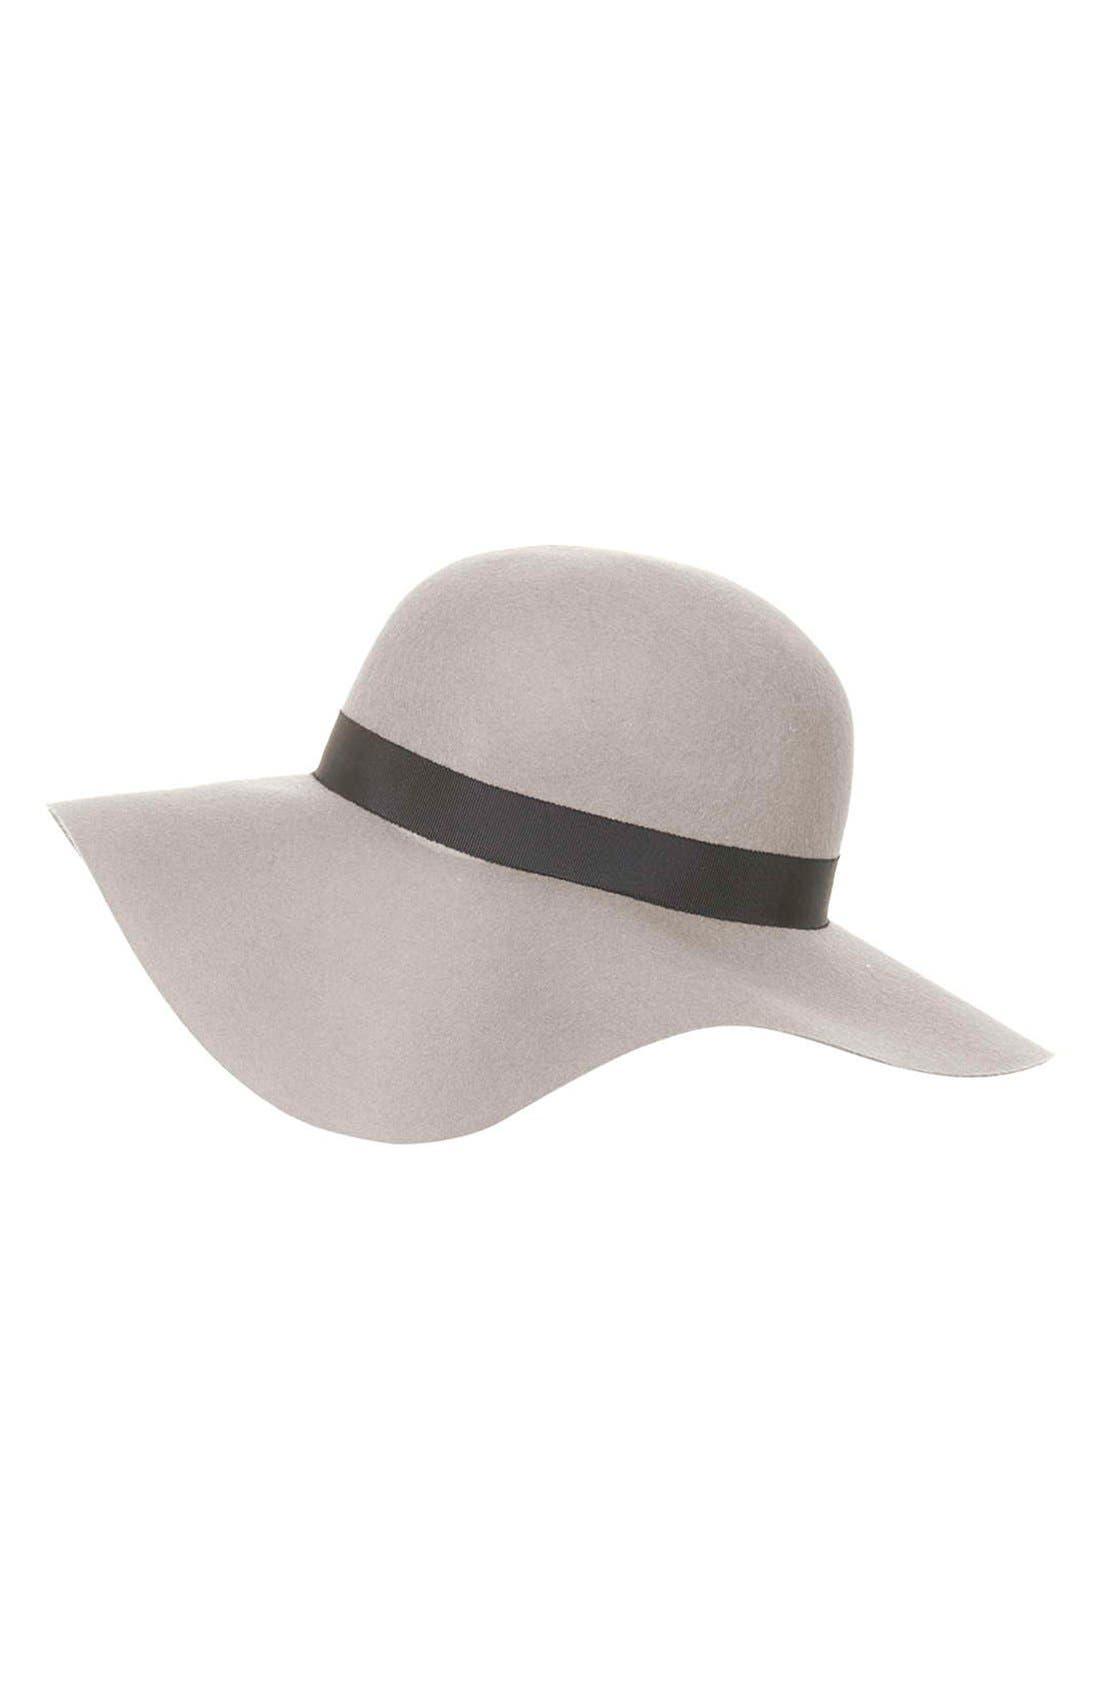 Alternate Image 3  - Topshop Floppy Wool Felt Hat